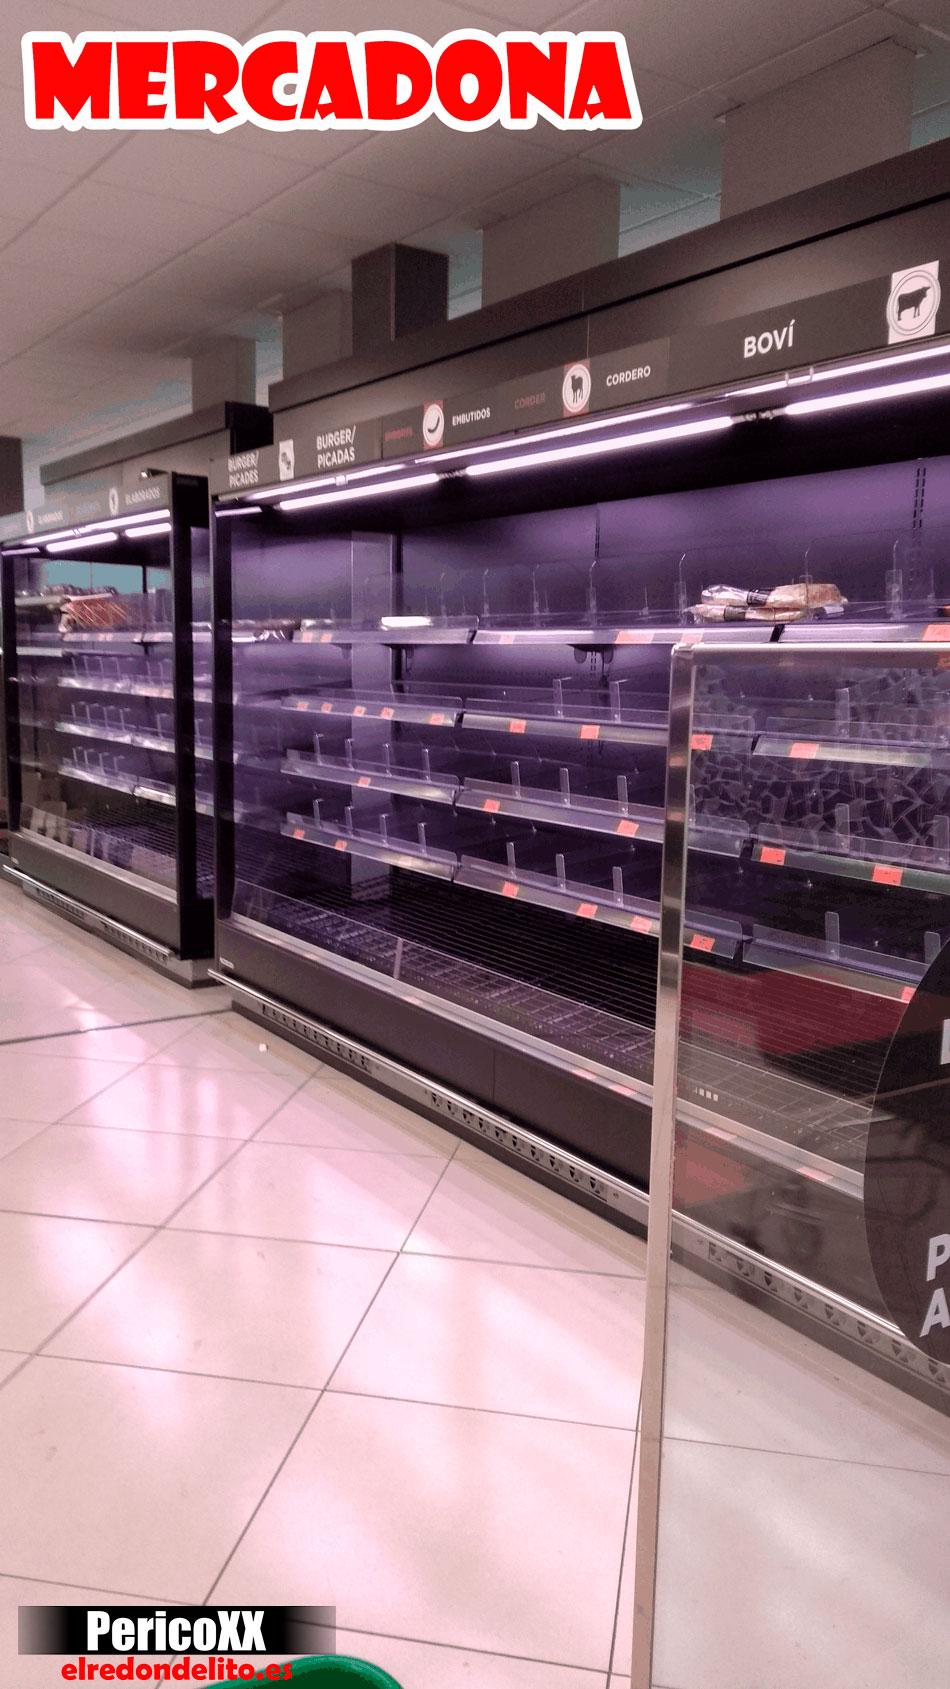 Supermercado Mercadona vacio 03-2020